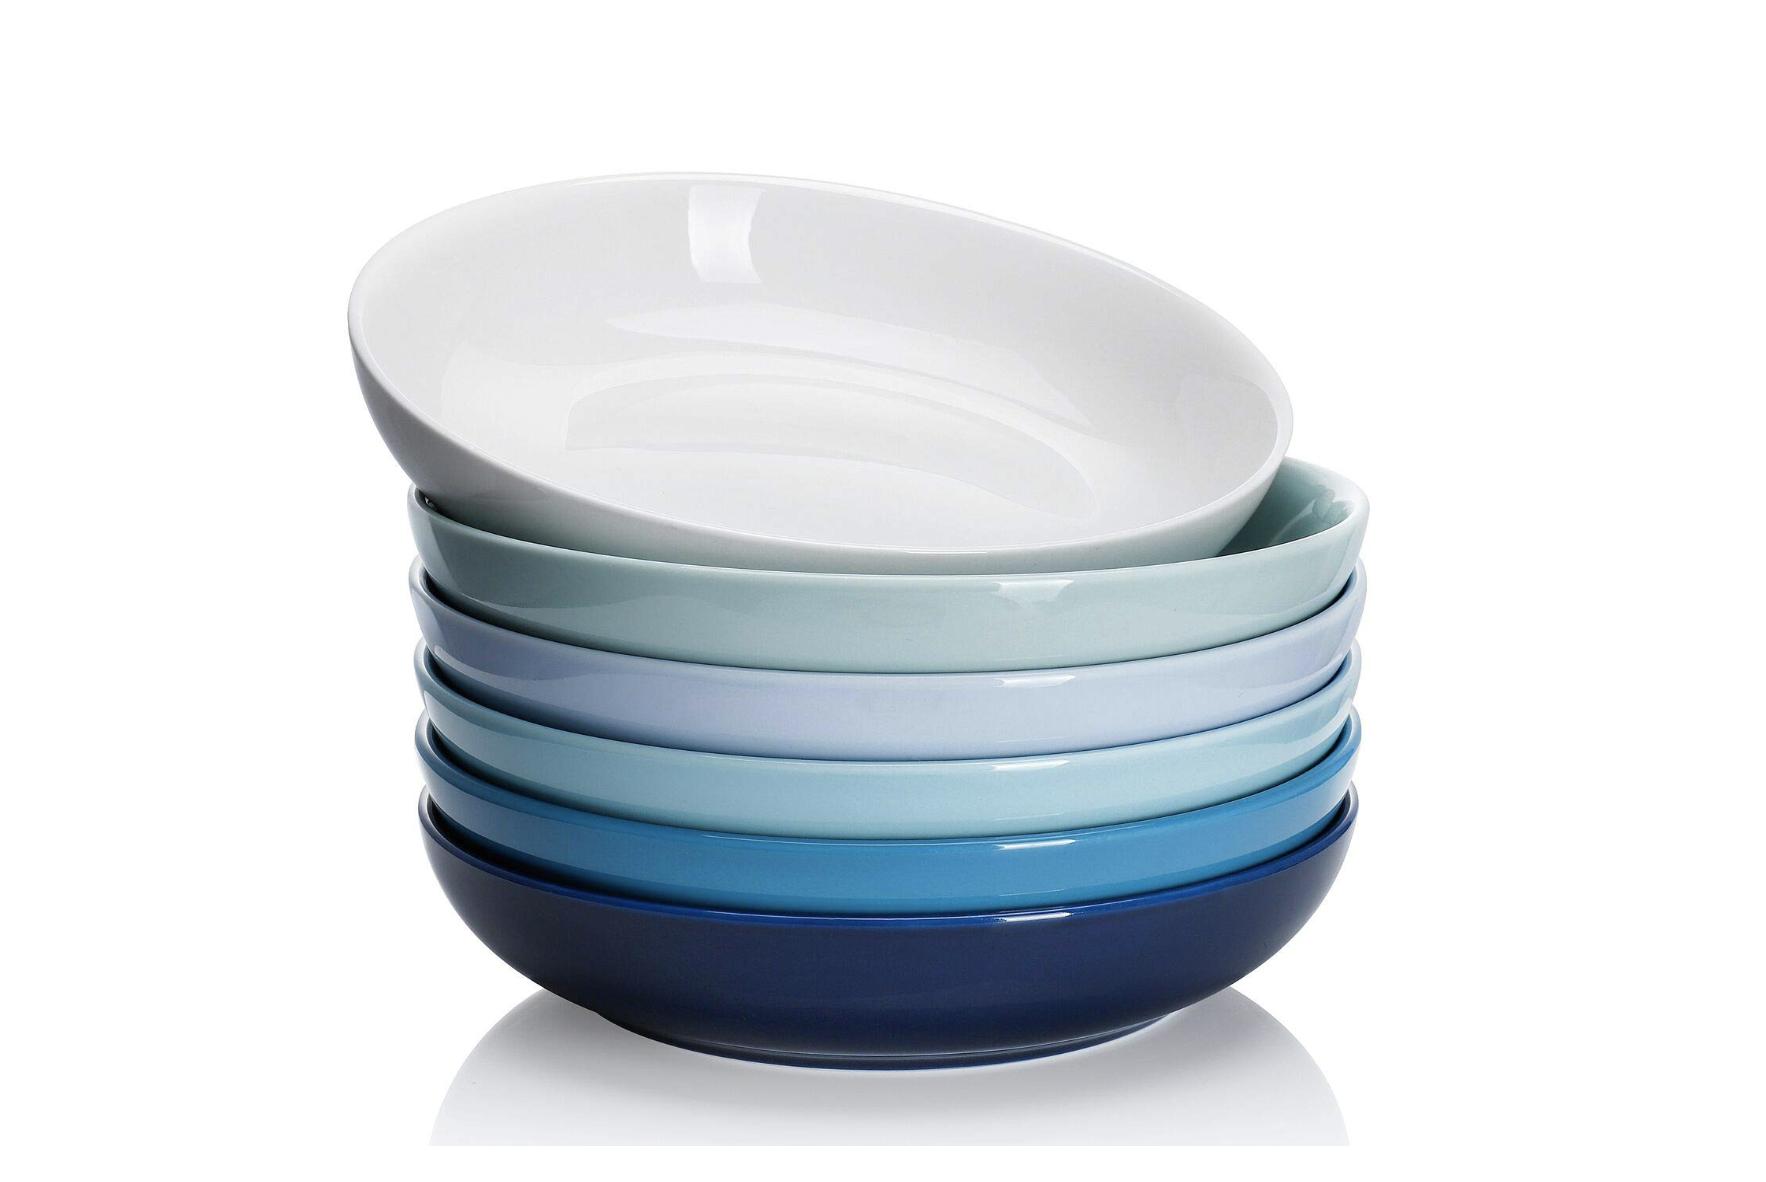 microwave safe plates